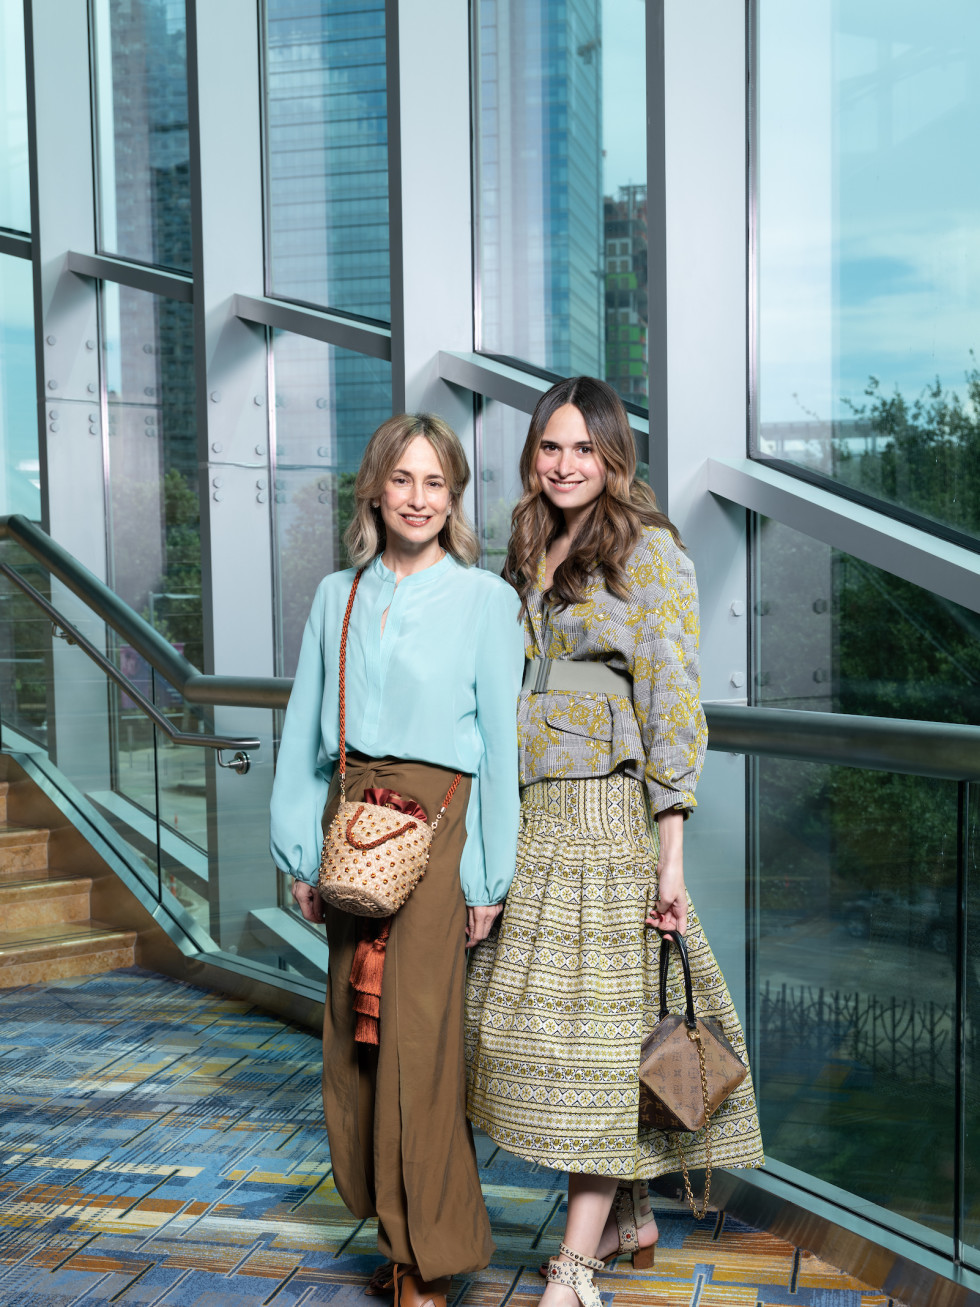 LWI Houston 2021 fashion show luncheon Silivi Tcherassi and Sofia Espinosa Tcherassi